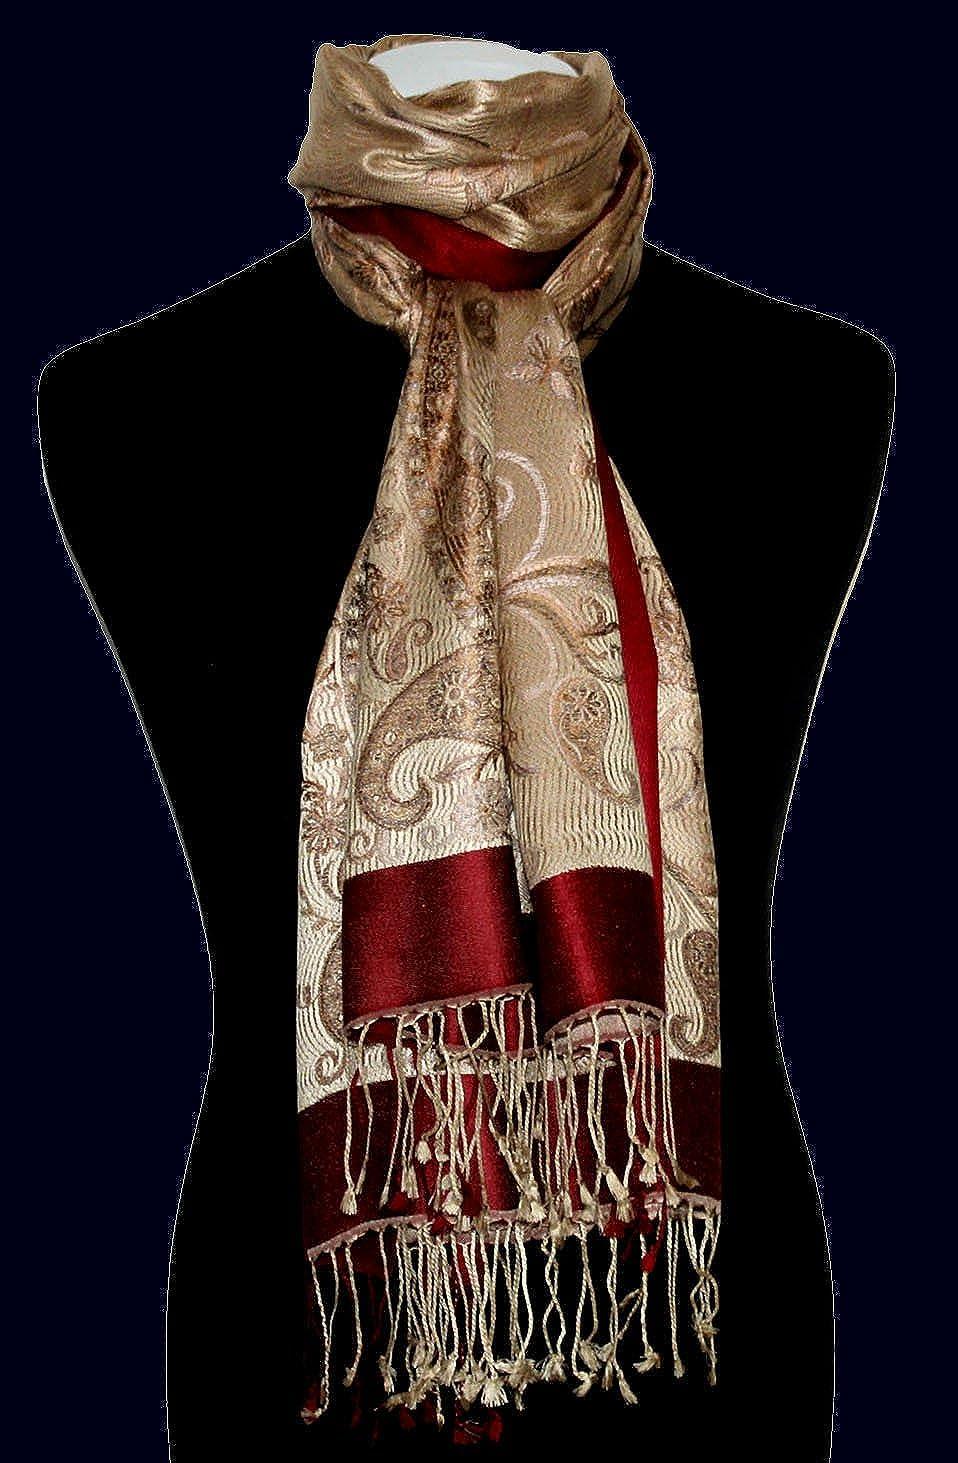 Lorenzo Cana Luxus Pashmina Damenschal Schaltuch jacquardgewebter Designerschal mit Fransen 100/% Seide 70 cm x 190 cm Paisleymuster Seidenschal Seidentuch Seidenpashmina harmonische Farben 78418